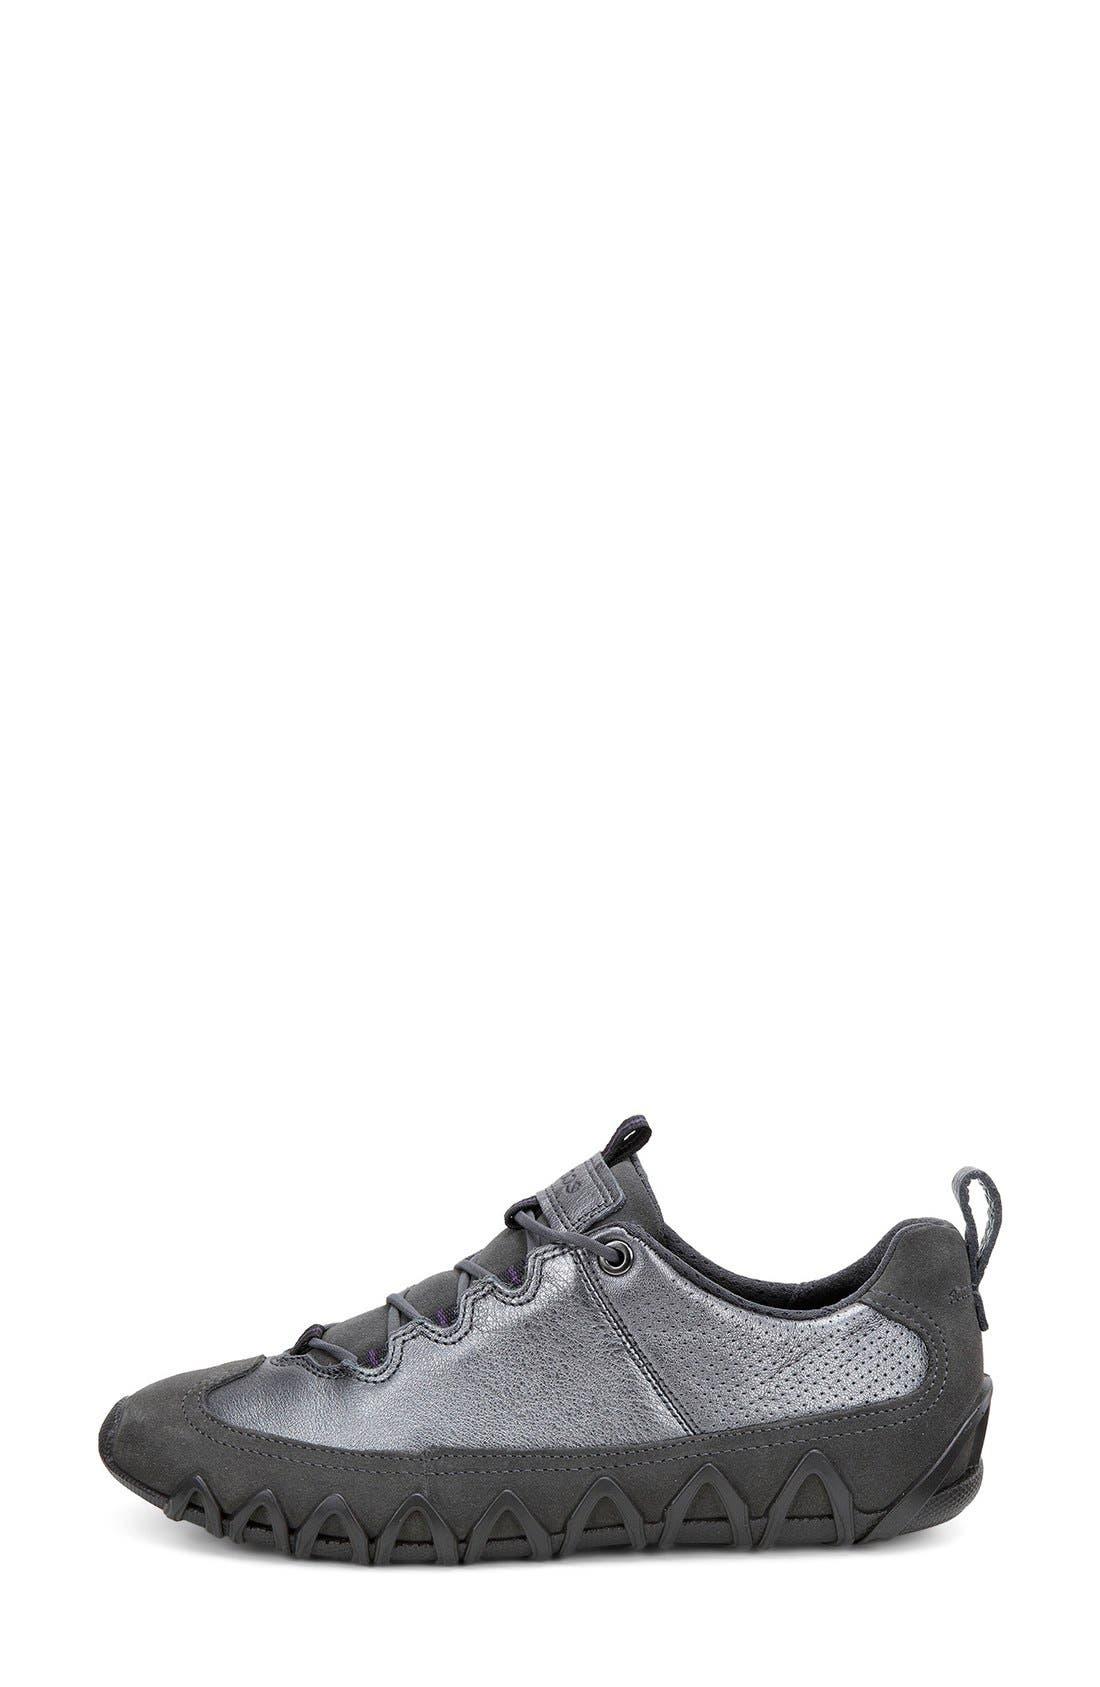 'Dayla' Toggle Sneaker,                             Alternate thumbnail 5, color,                             040